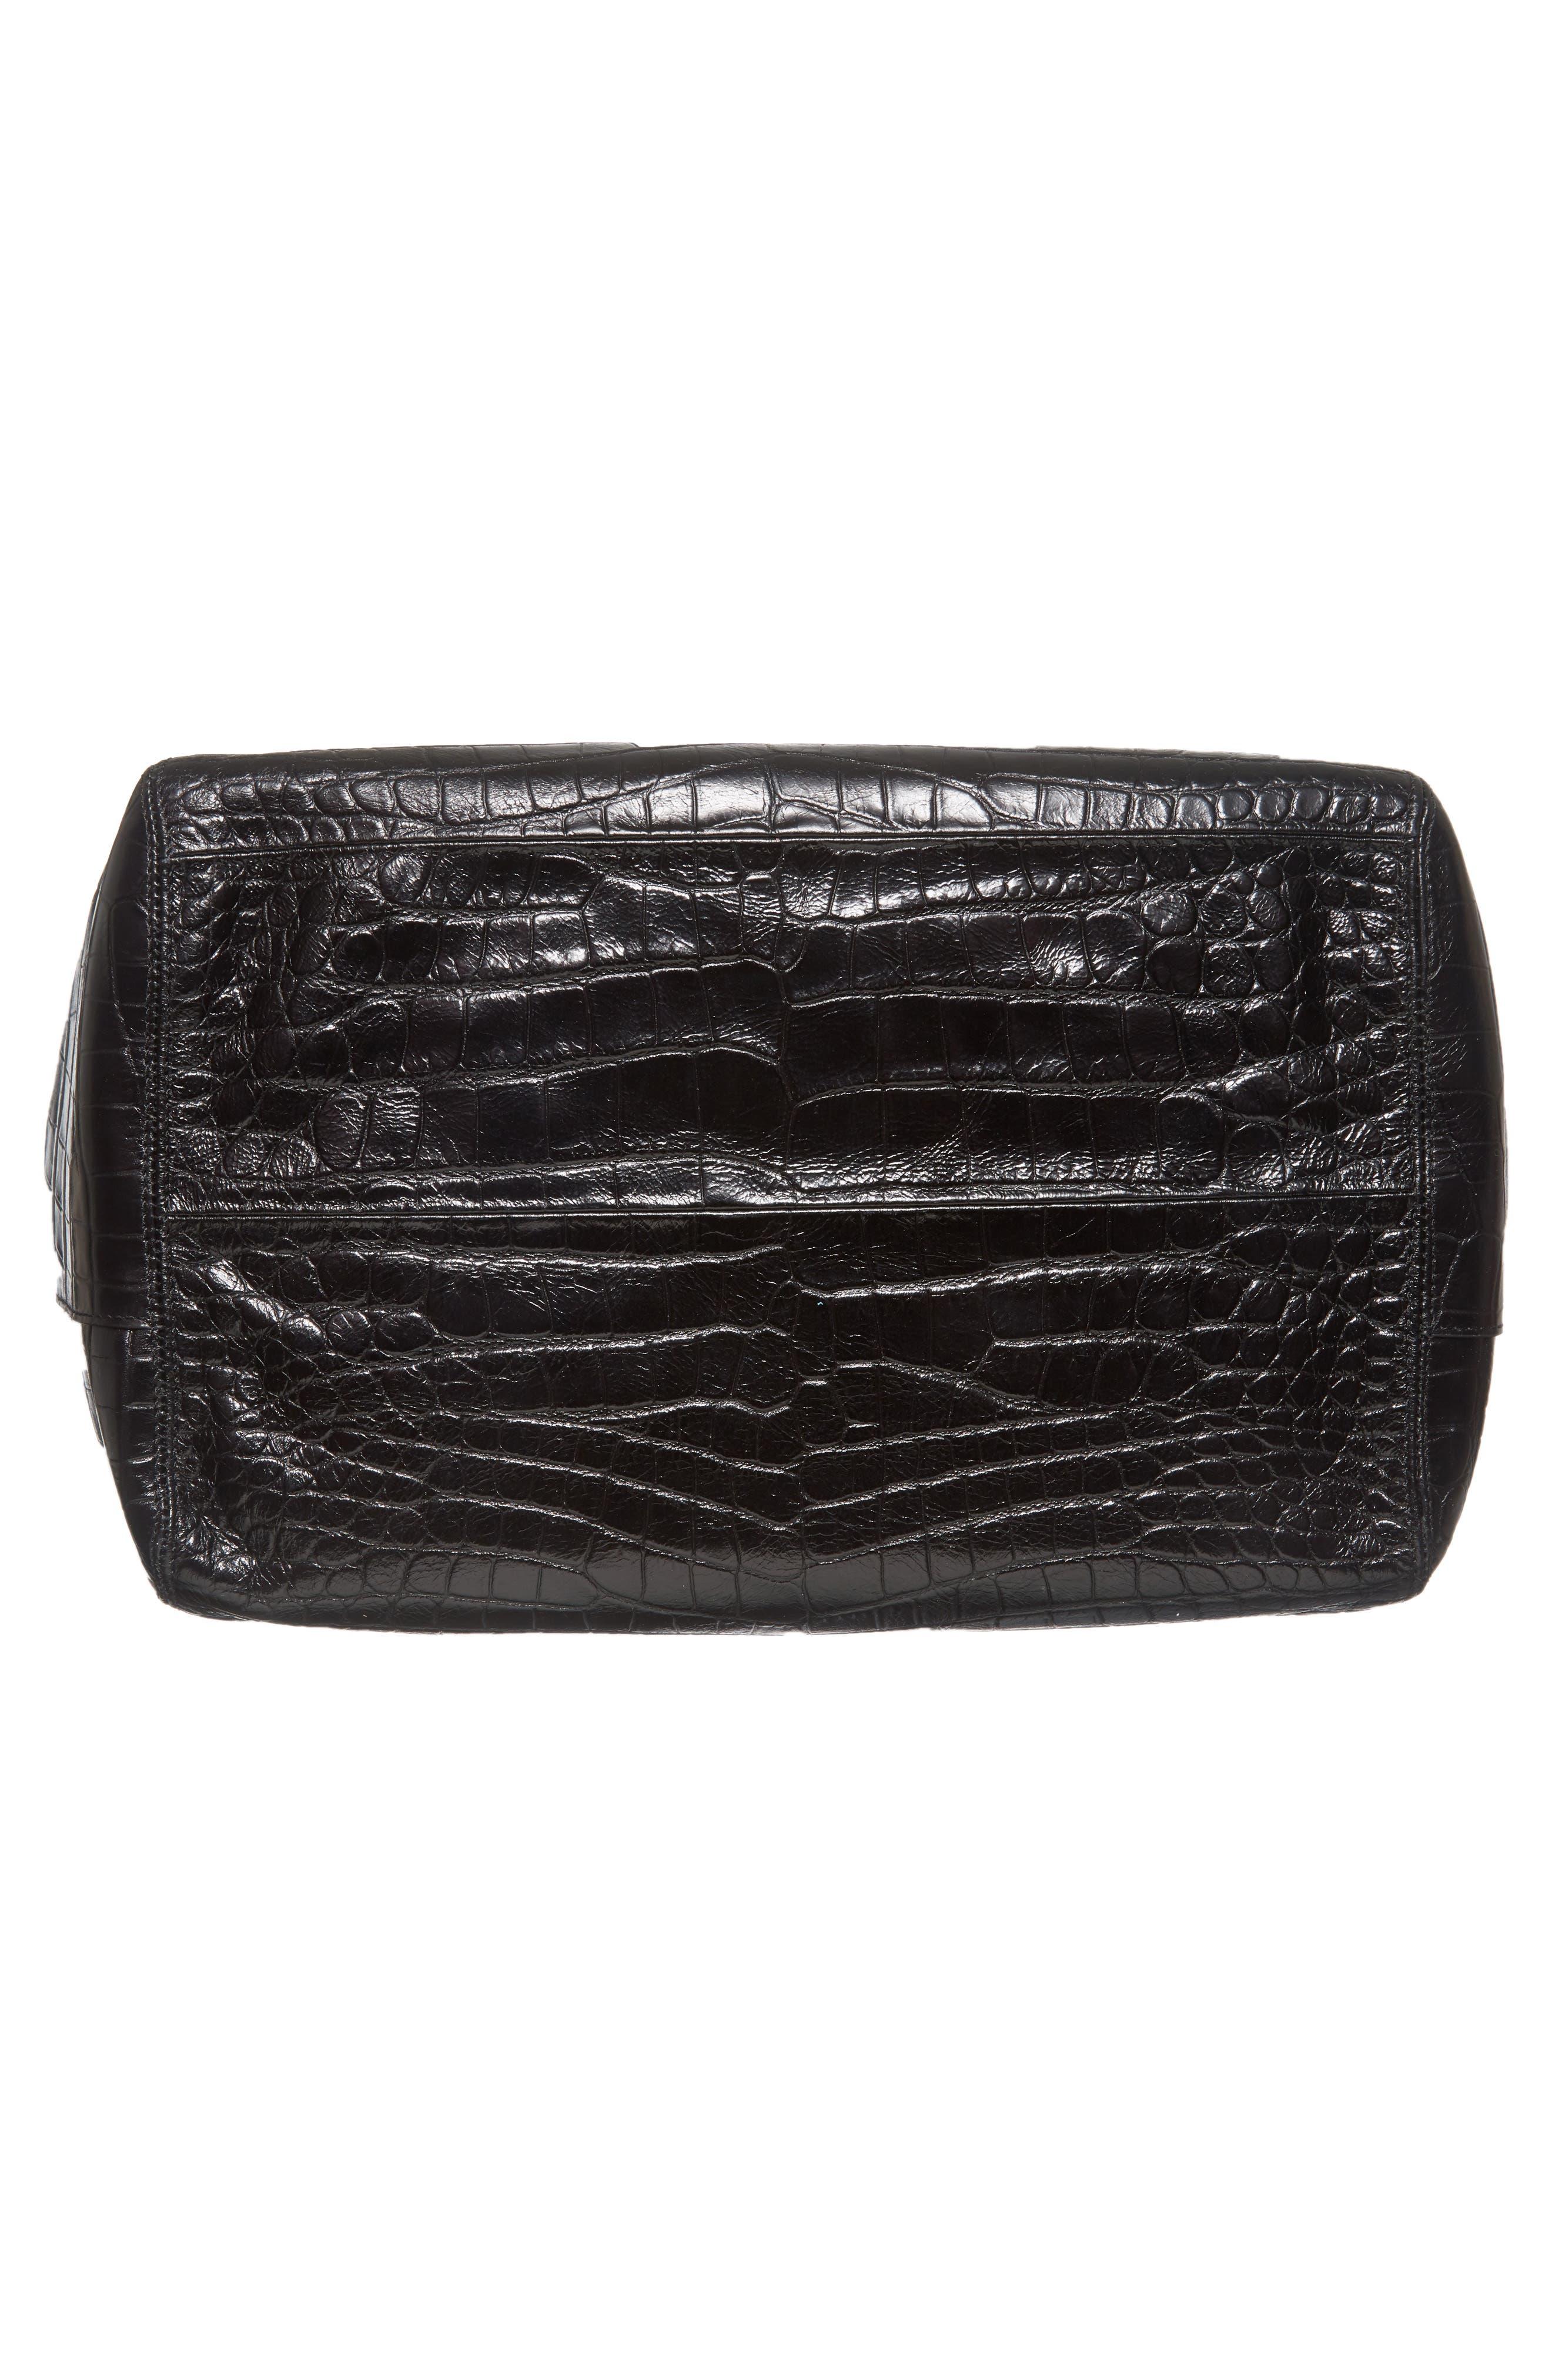 Mini Keely Newspaper Croc Embossed Leather Shoulder/Crossbody Bag,                             Alternate thumbnail 6, color,                             001